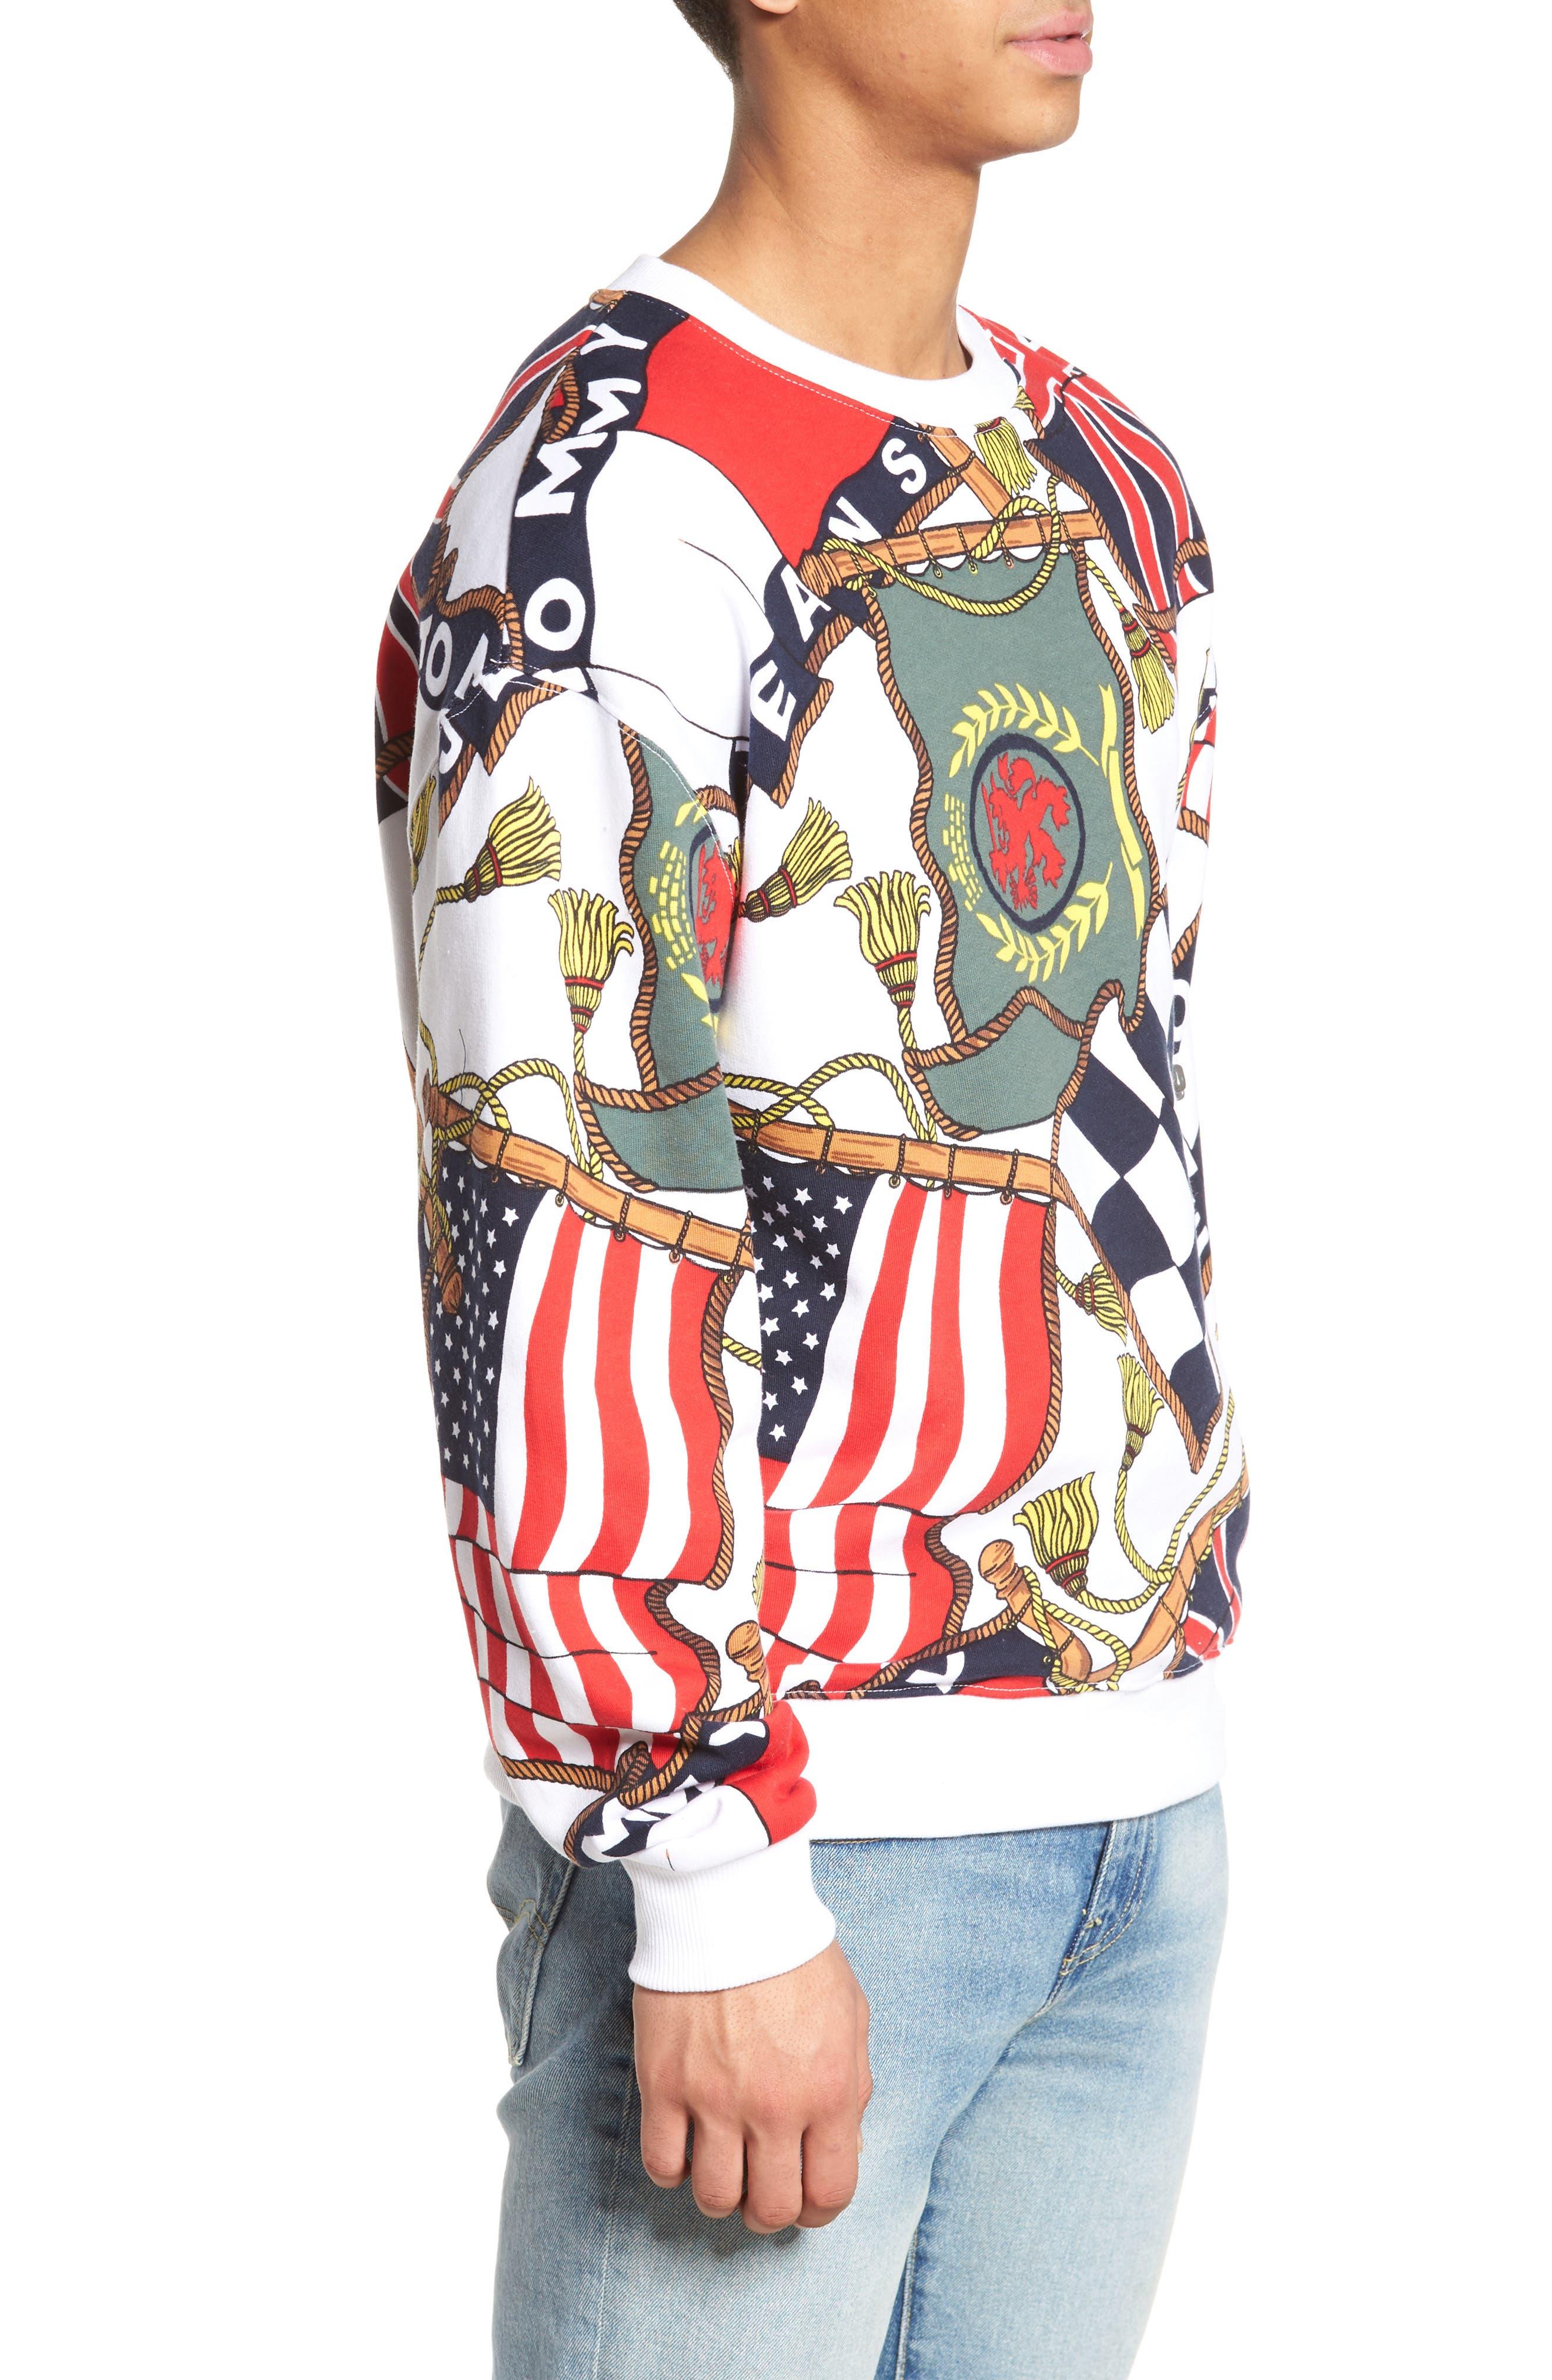 TOMMY HILFIGER,                             90s Sweatshirt,                             Alternate thumbnail 3, color,                             101